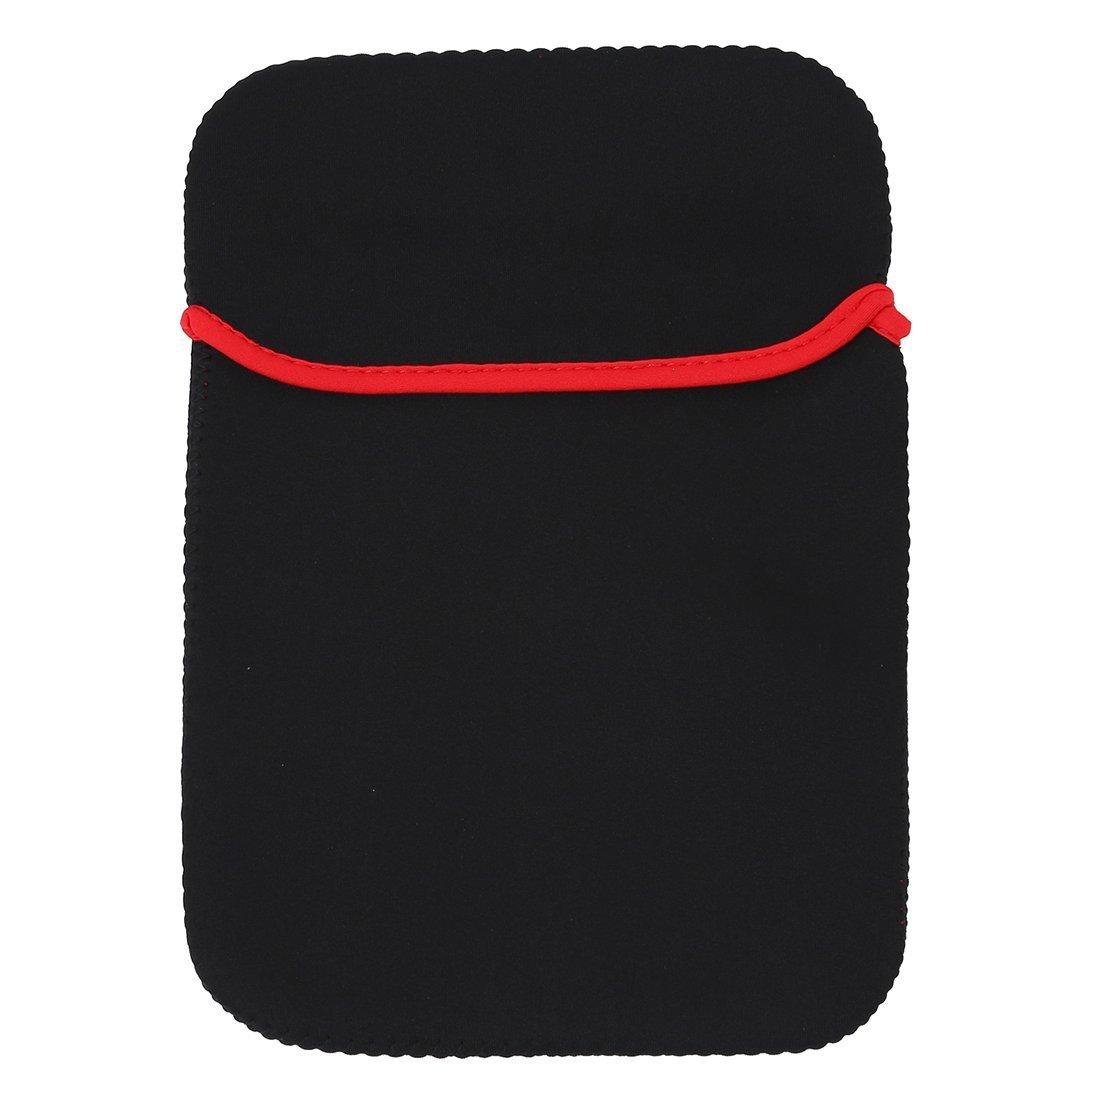 R SODIAL Maletn Funda Porttil para Tablet PC PDA Ebook Netbook 10 Color Negro